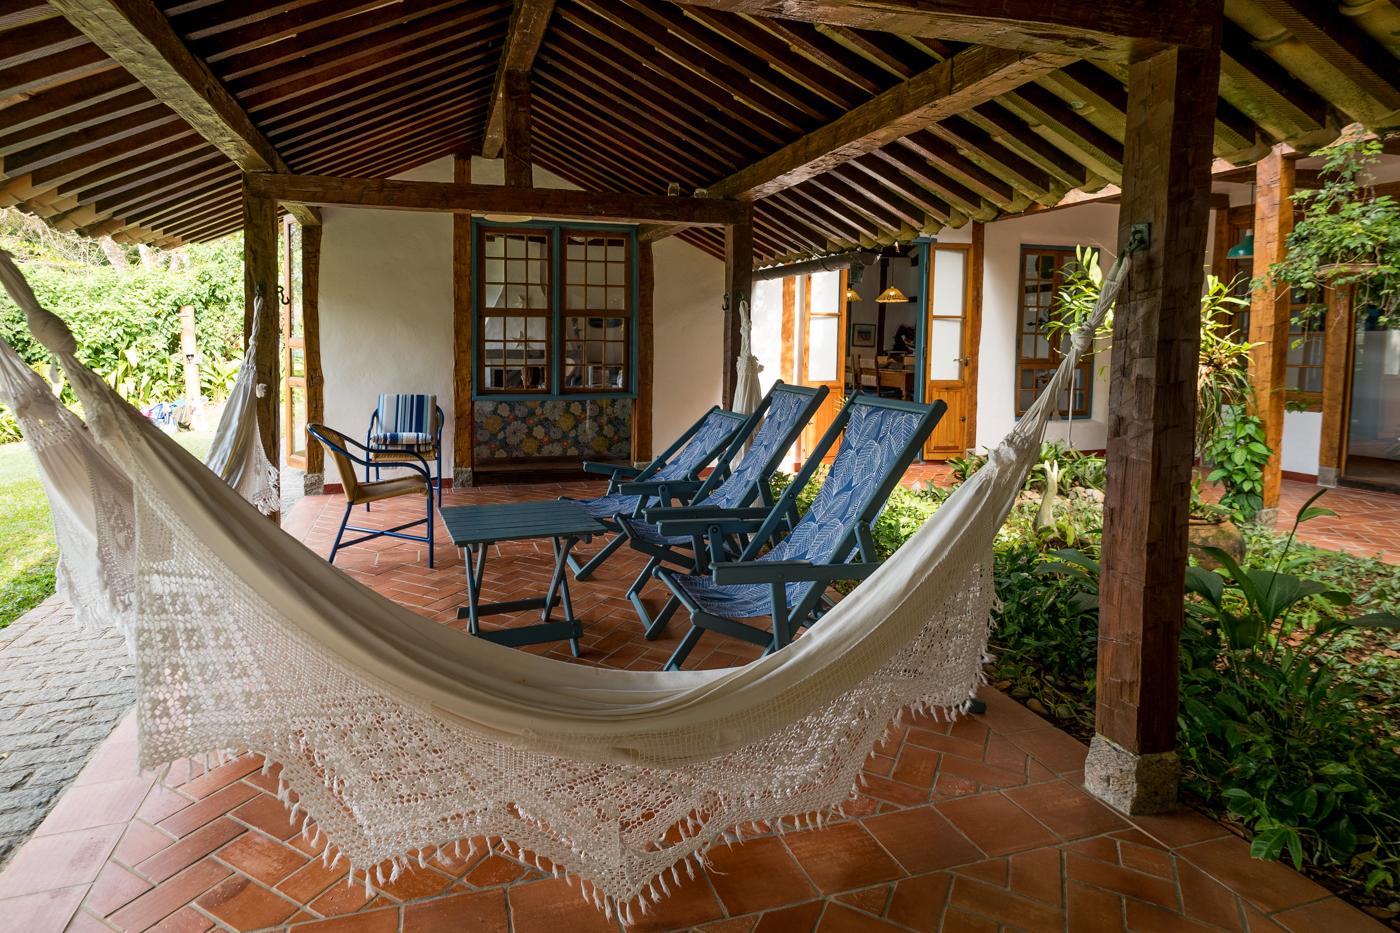 Ubatuba_airbnb-7.jpg